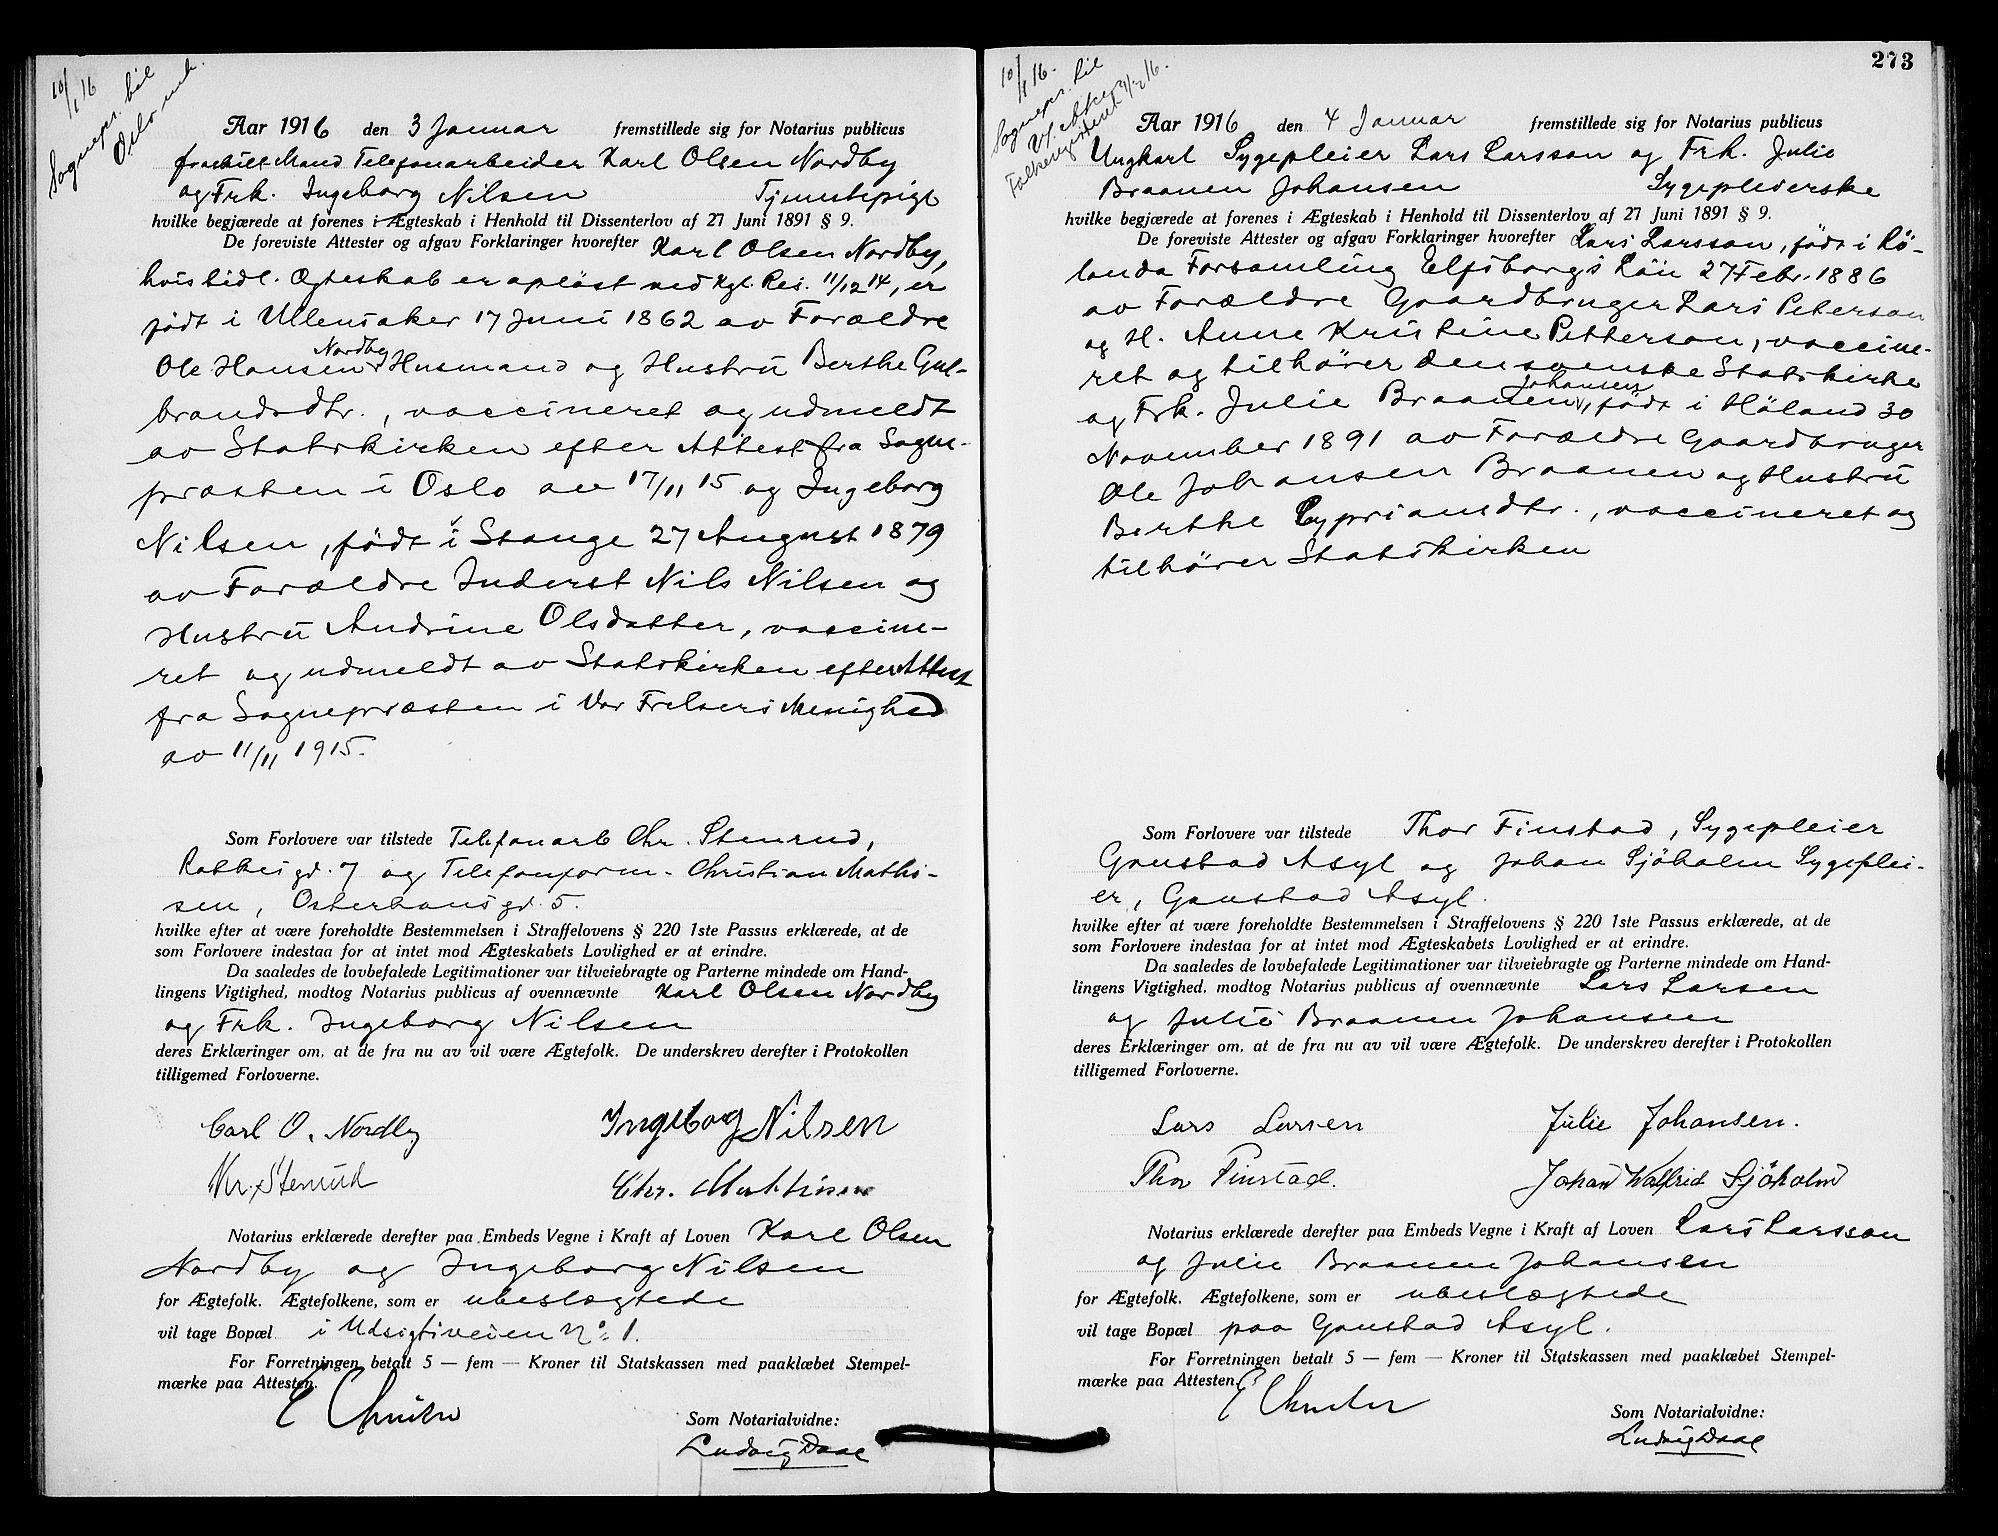 SAO, Oslo byfogd avd. I, L/Lb/Lbb/L0010: Notarialprotokoll, rekke II: Vigsler, 1914-1916, p. 272b-273a